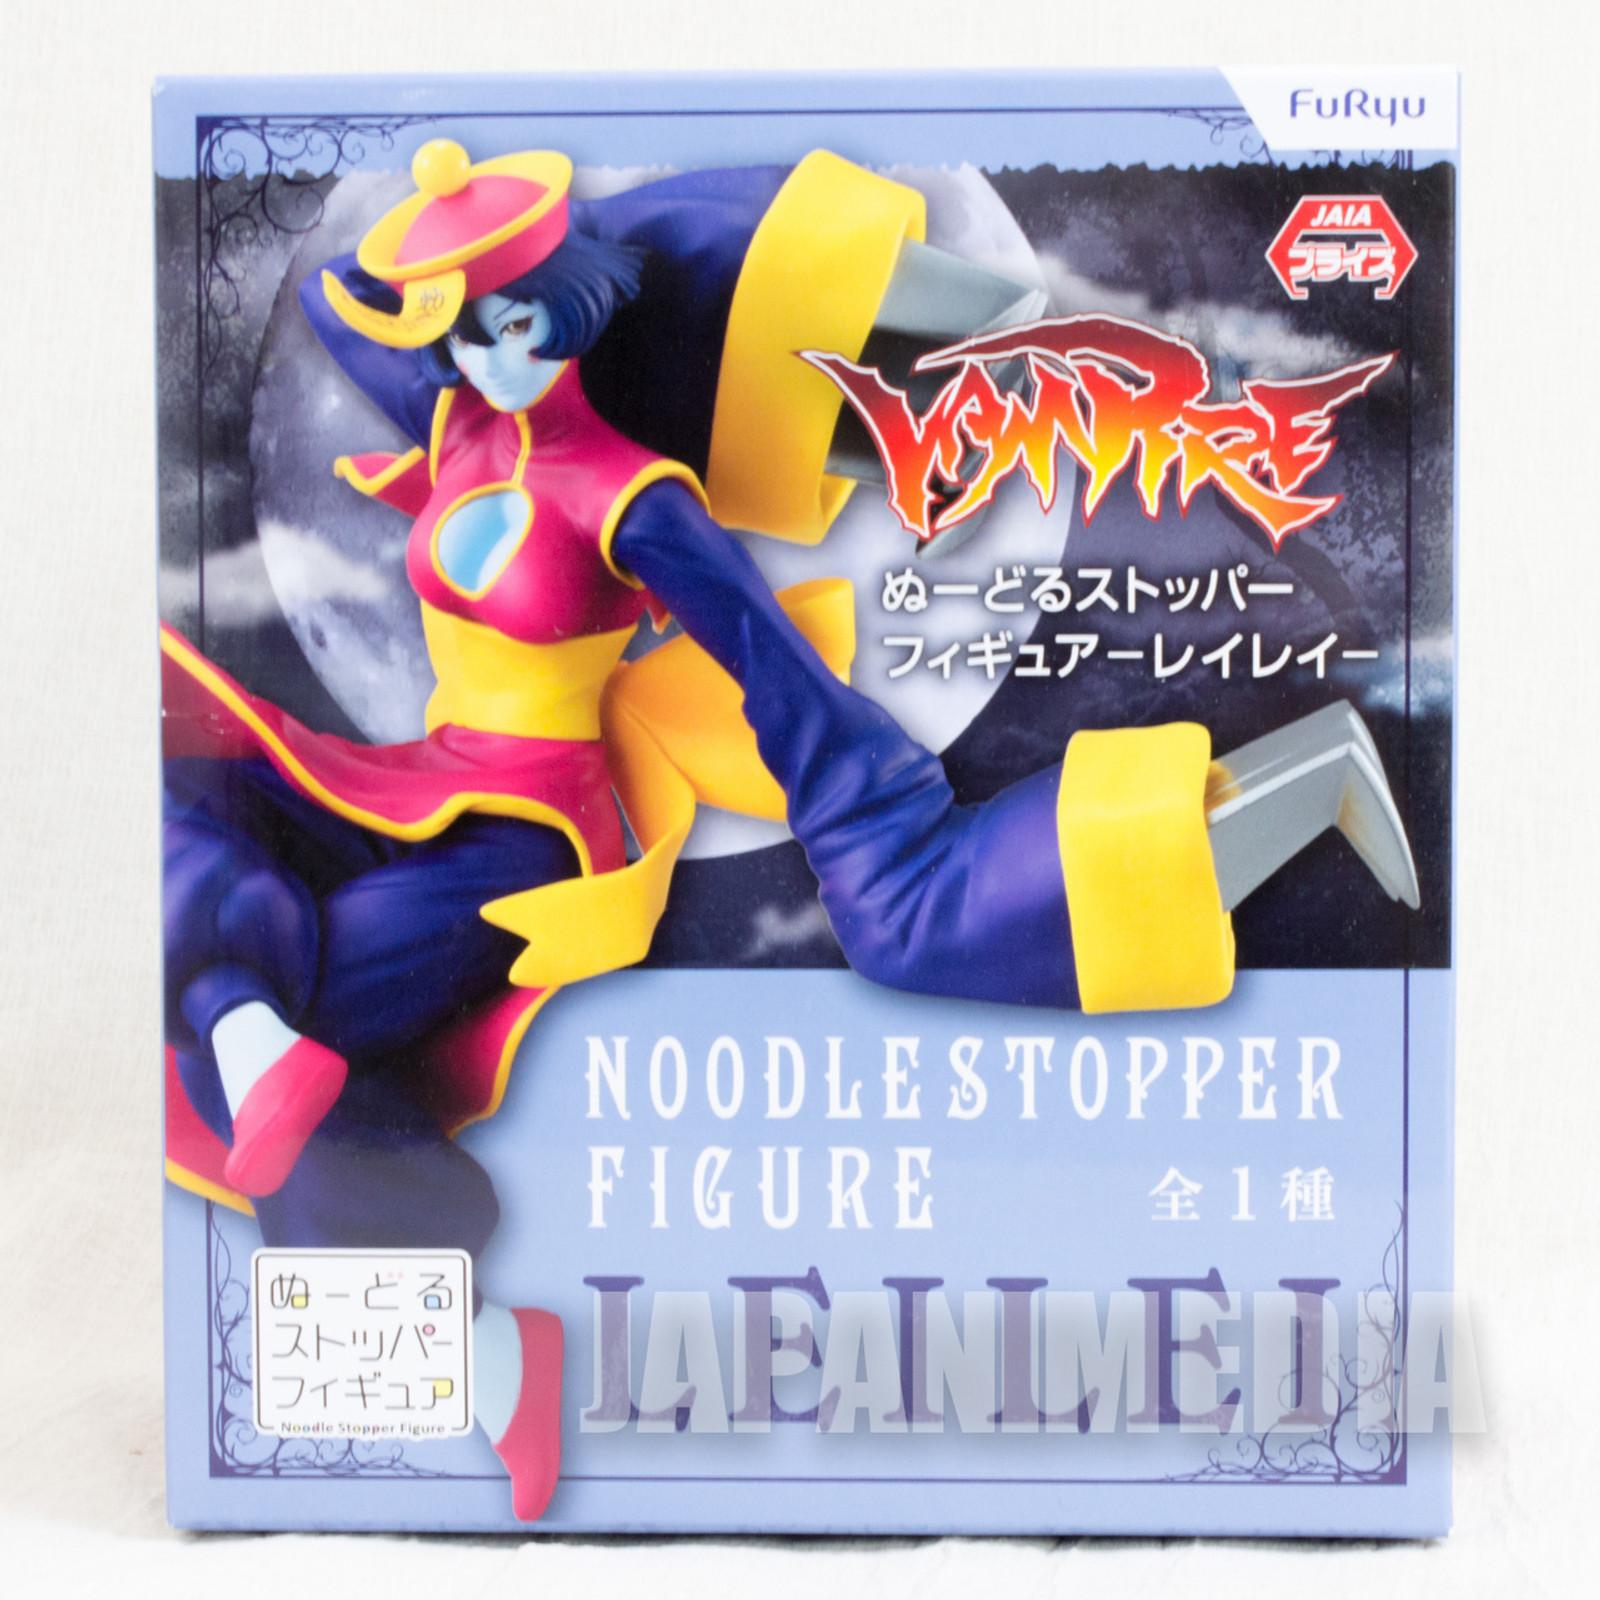 Darkstalkers (Vampire) Savior LeiLei Noodle Stopper Figure Furyu JAPAN GAME